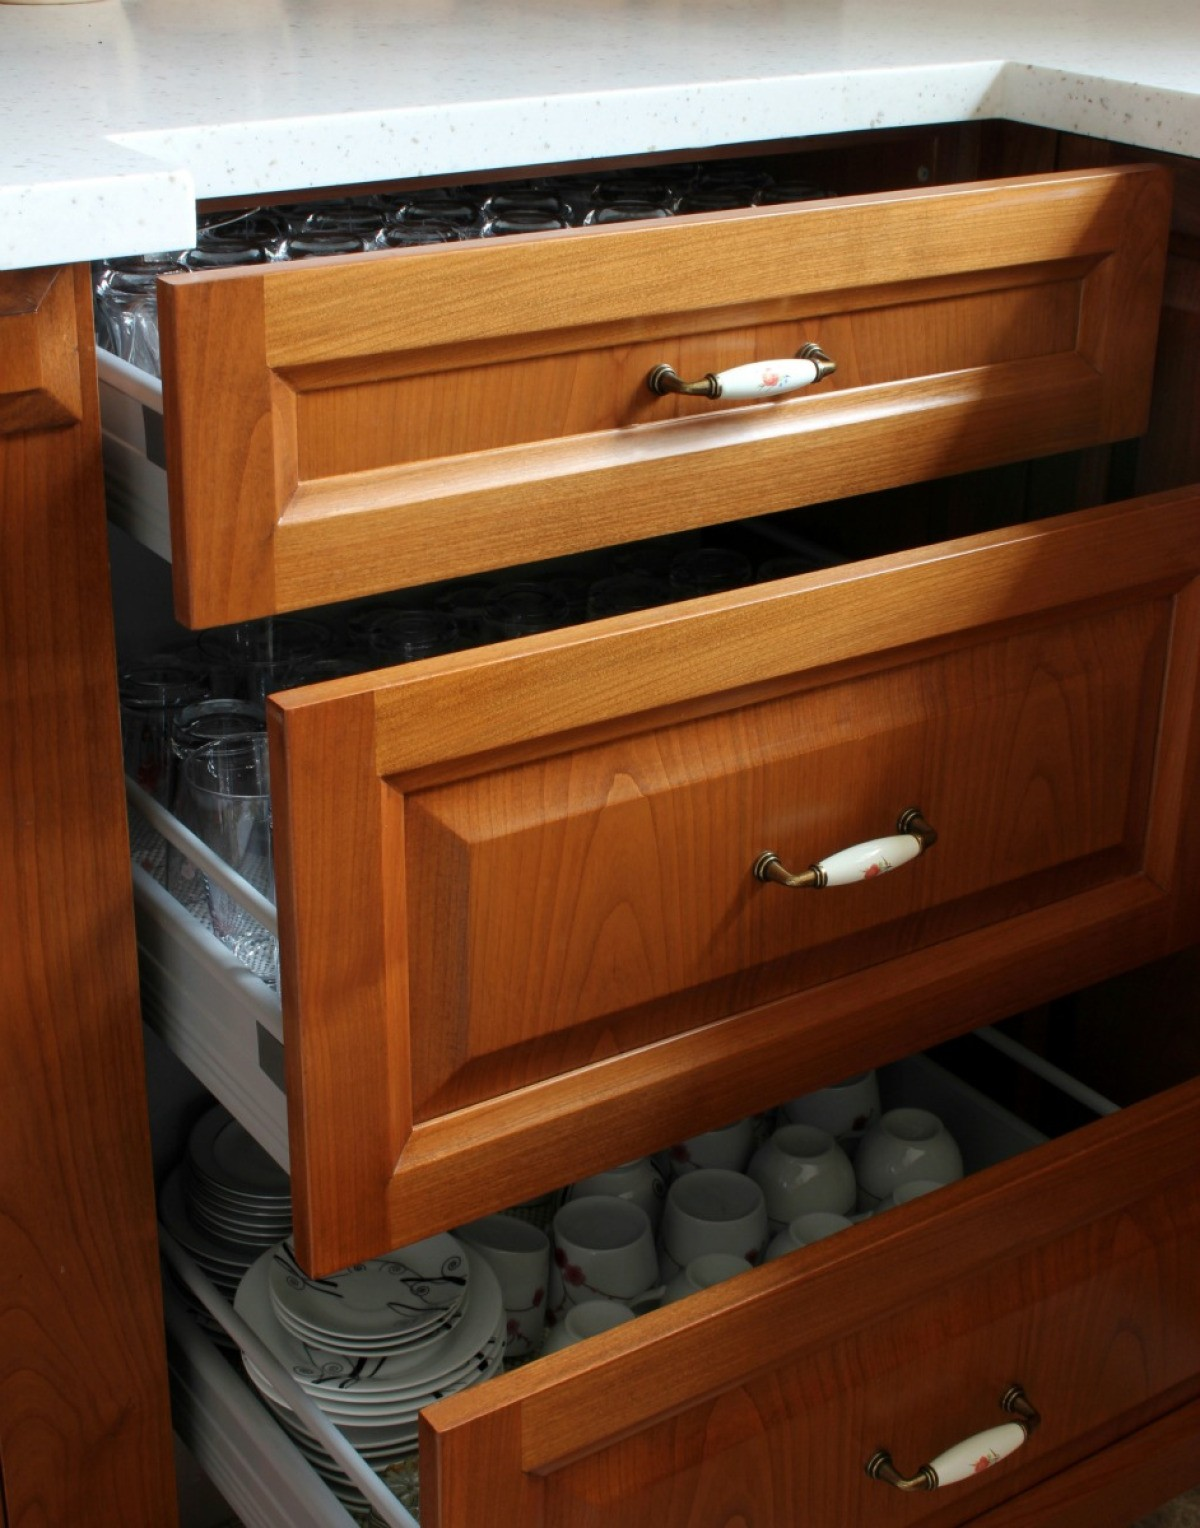 Drawer and Shelf Liner Ideas | ThriftyFun